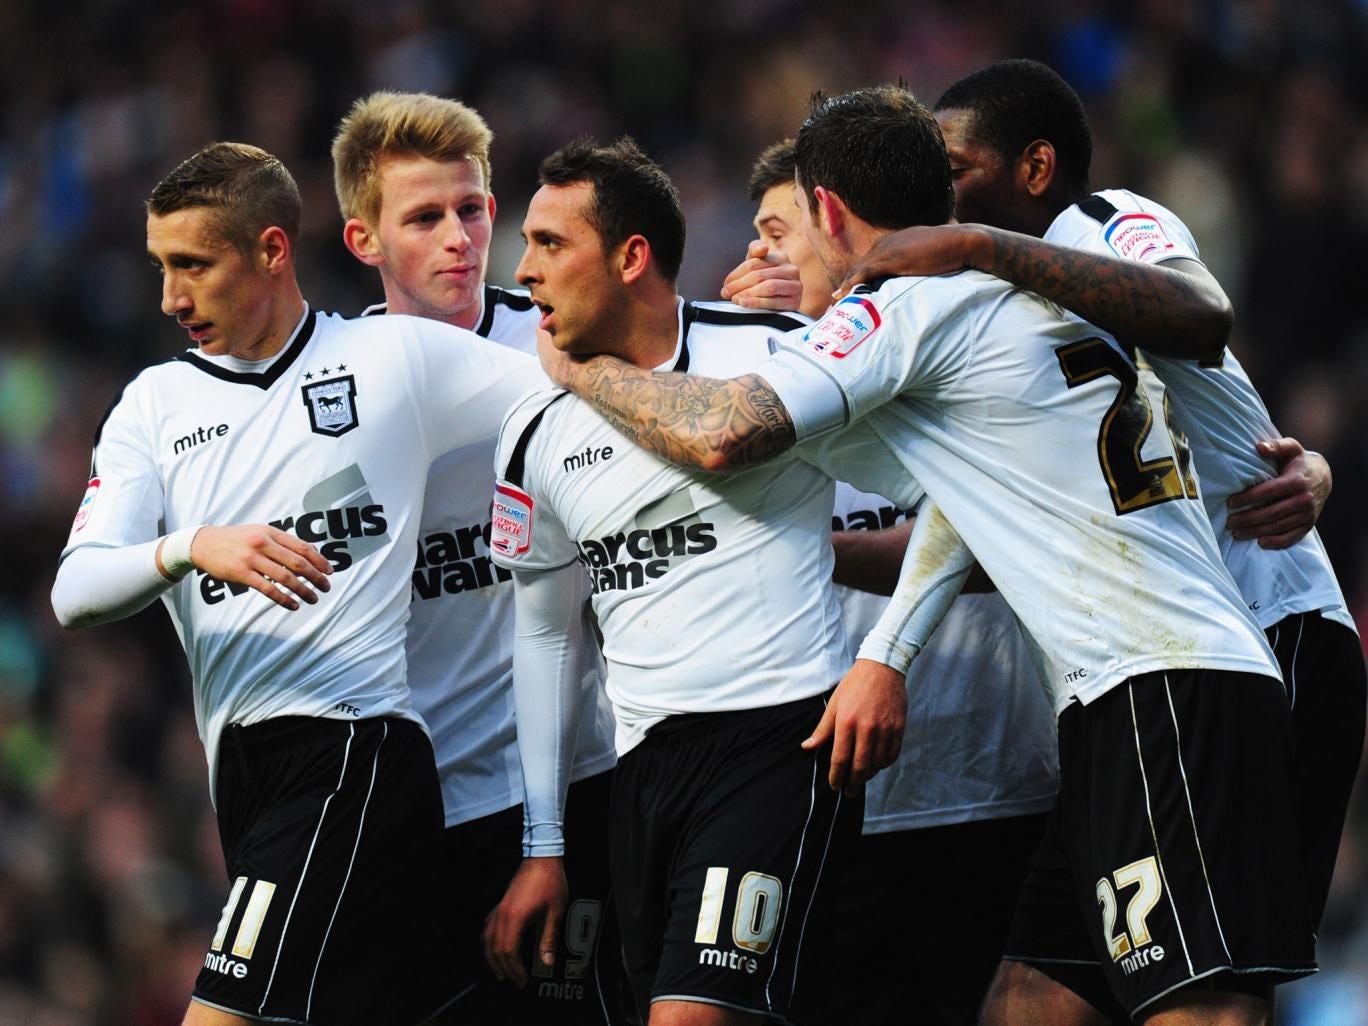 Michael Chopra (C) of Ipswich Town celebrates with team mates